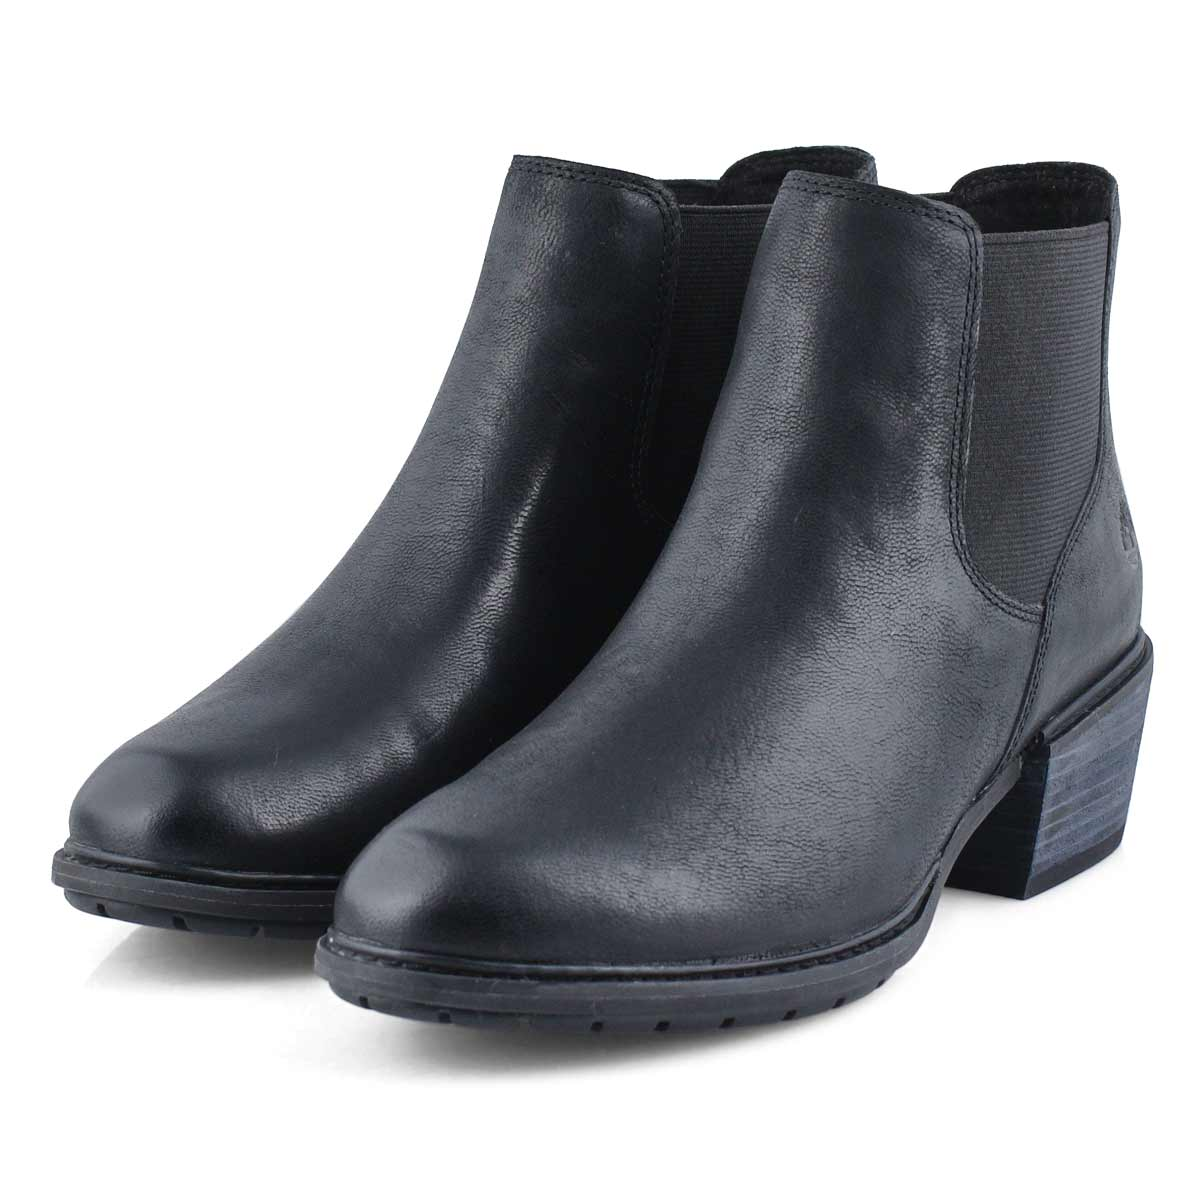 Women's Sutherlin Bay Low Chelsea Boot - Black